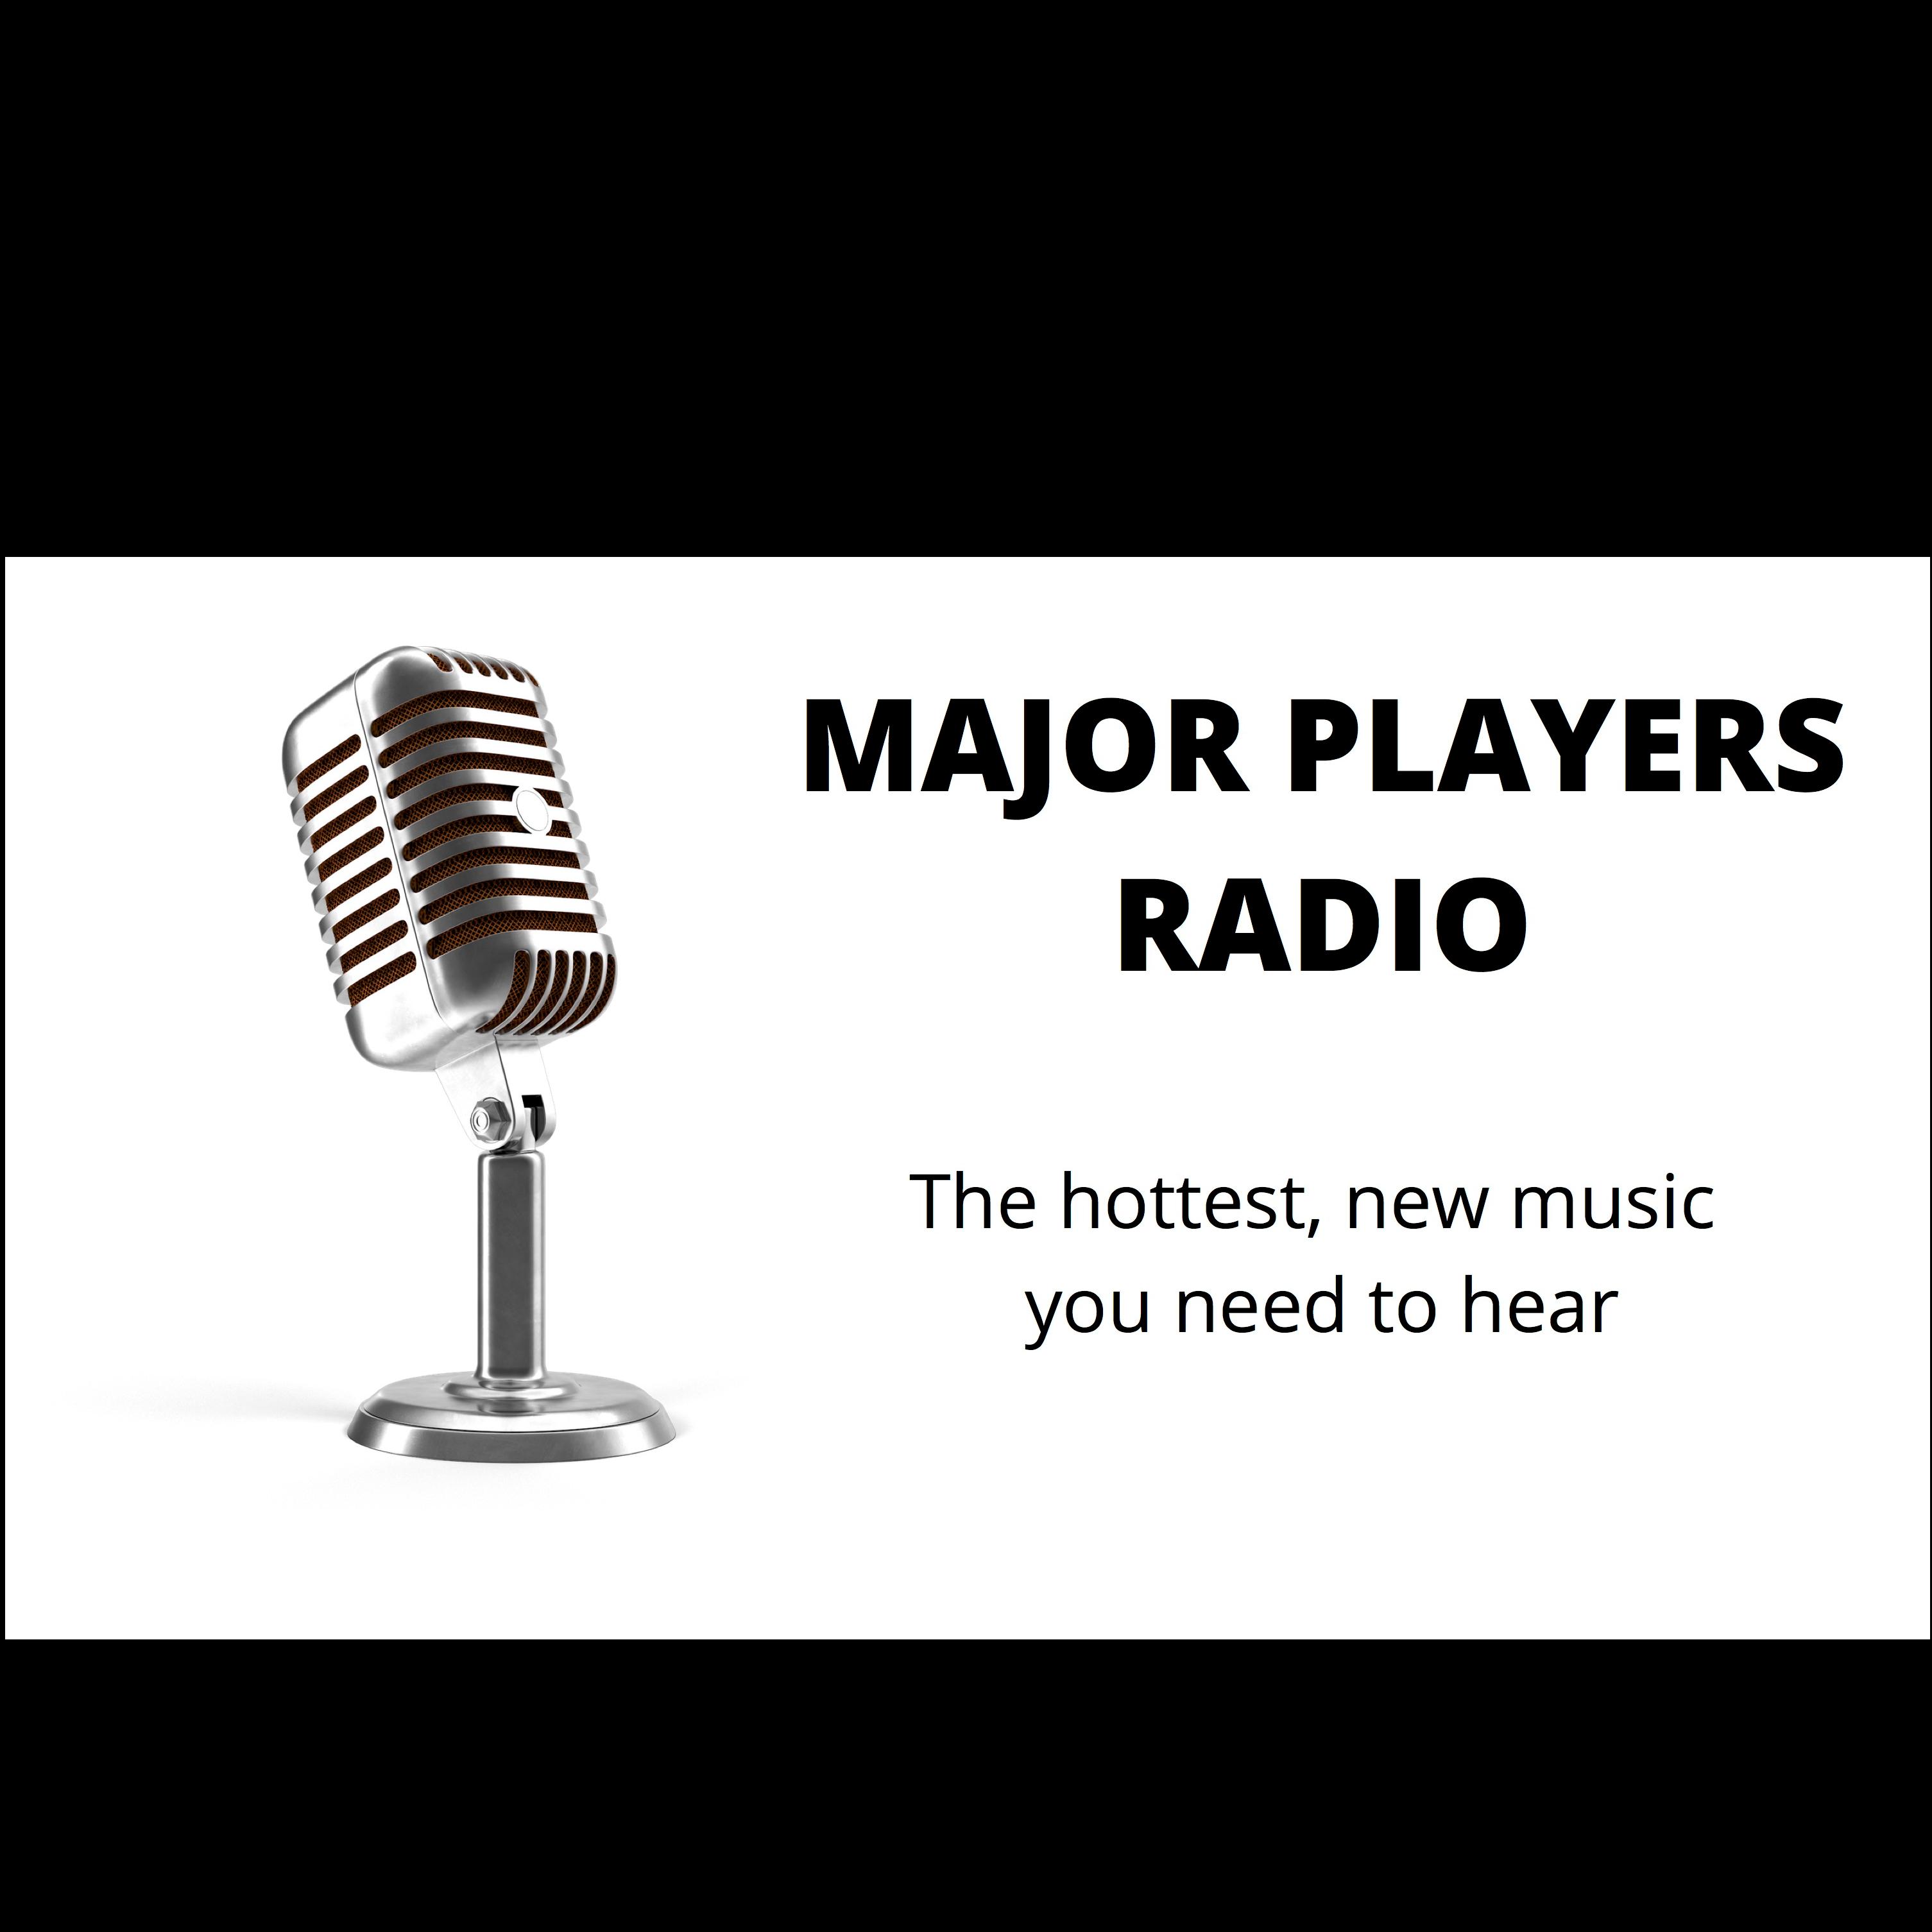 Major Players Radio